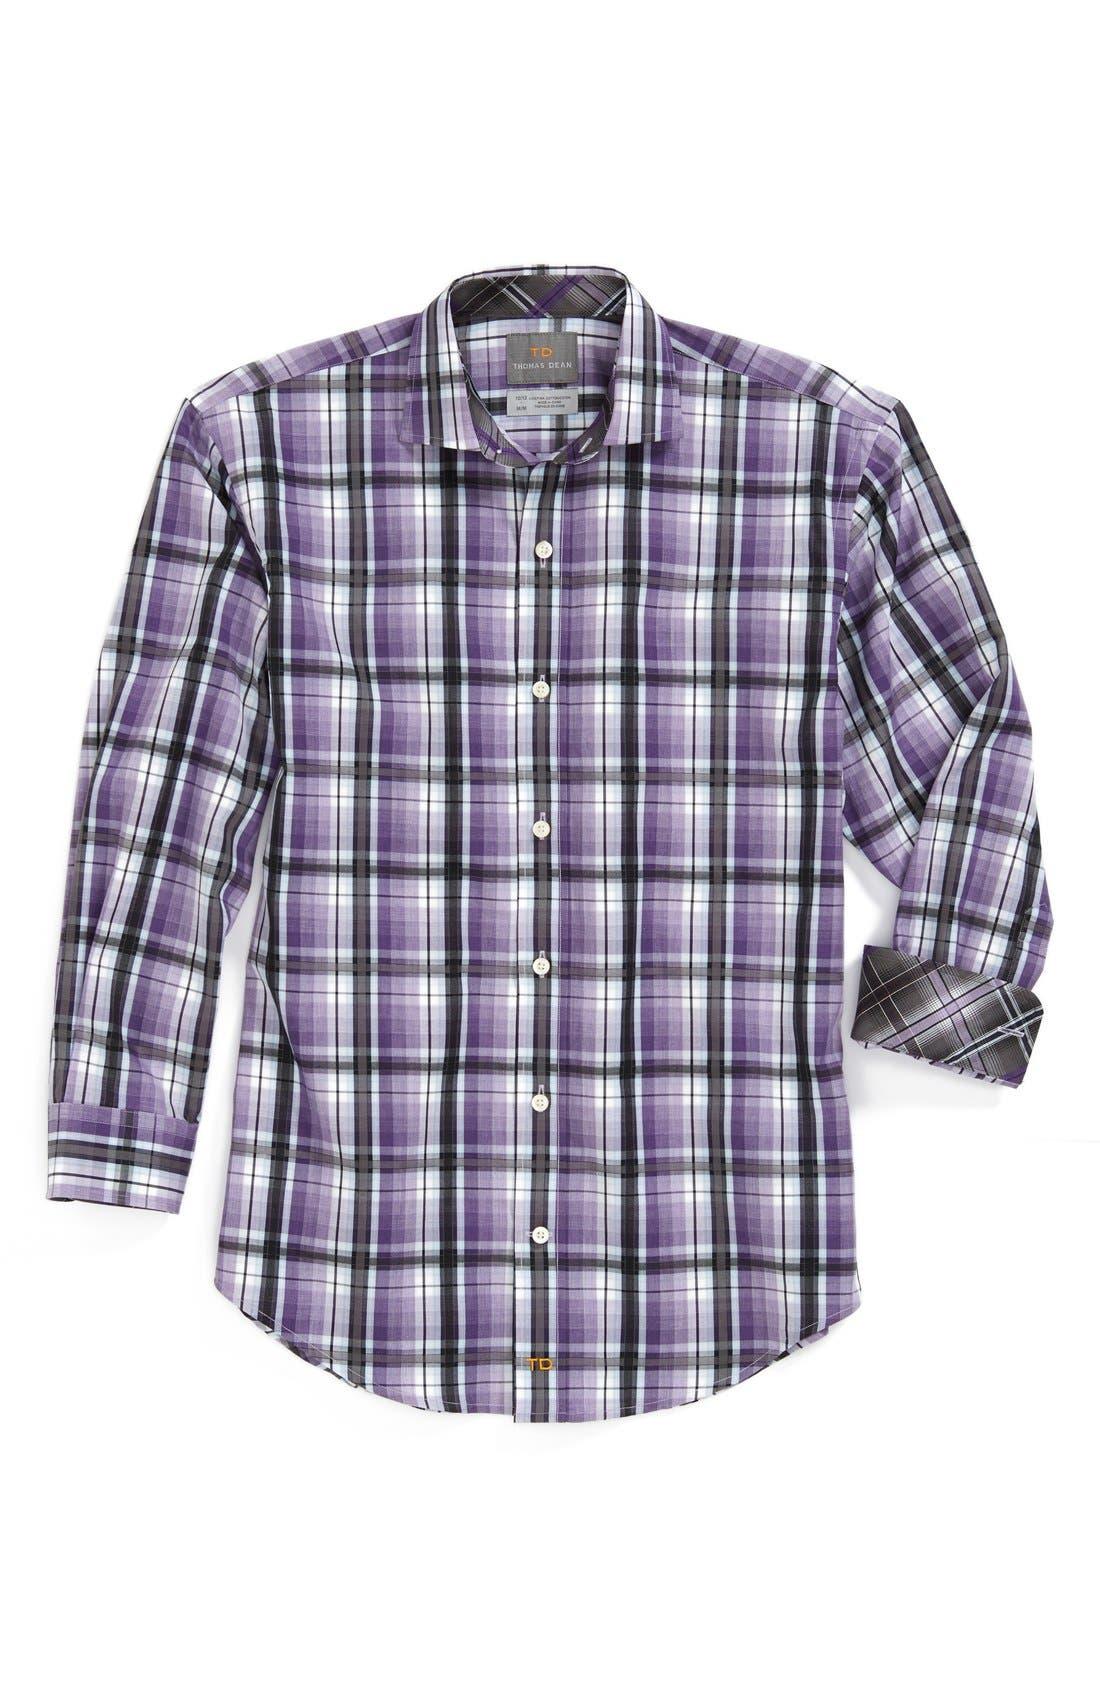 Main Image - Thomas Dean Plaid Cotton Poplin Dress Shirt (Big Boys)